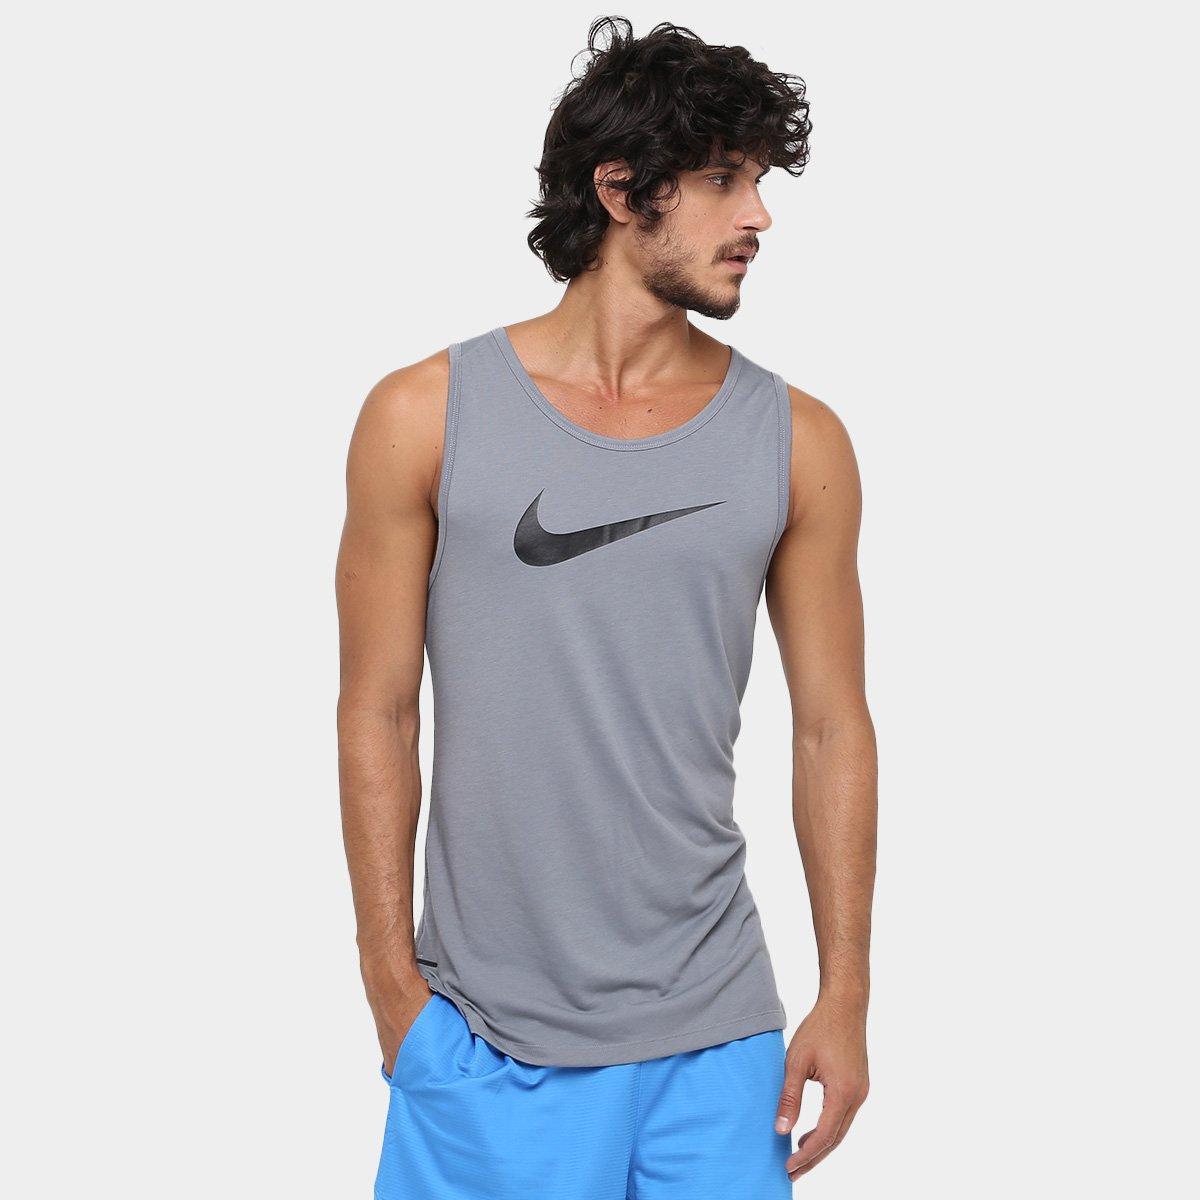 Camiseta Regata Nike Top SL Elite Masculina - Compre Agora  f629ef83872